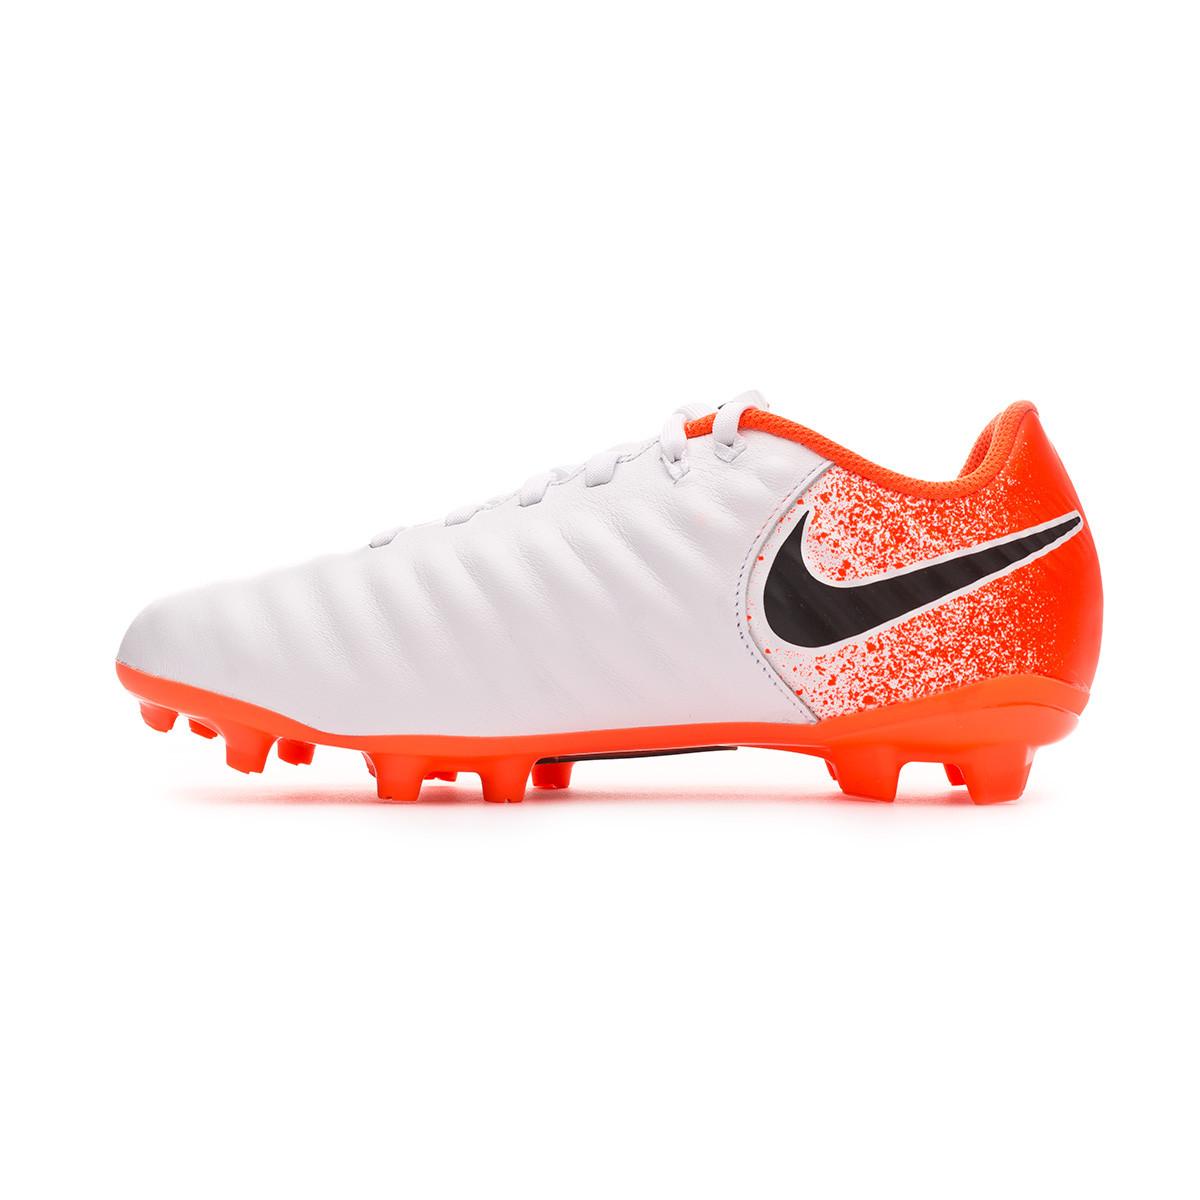 Chaussure de foot Nike Tiempo Legend VII Academy MG enfant